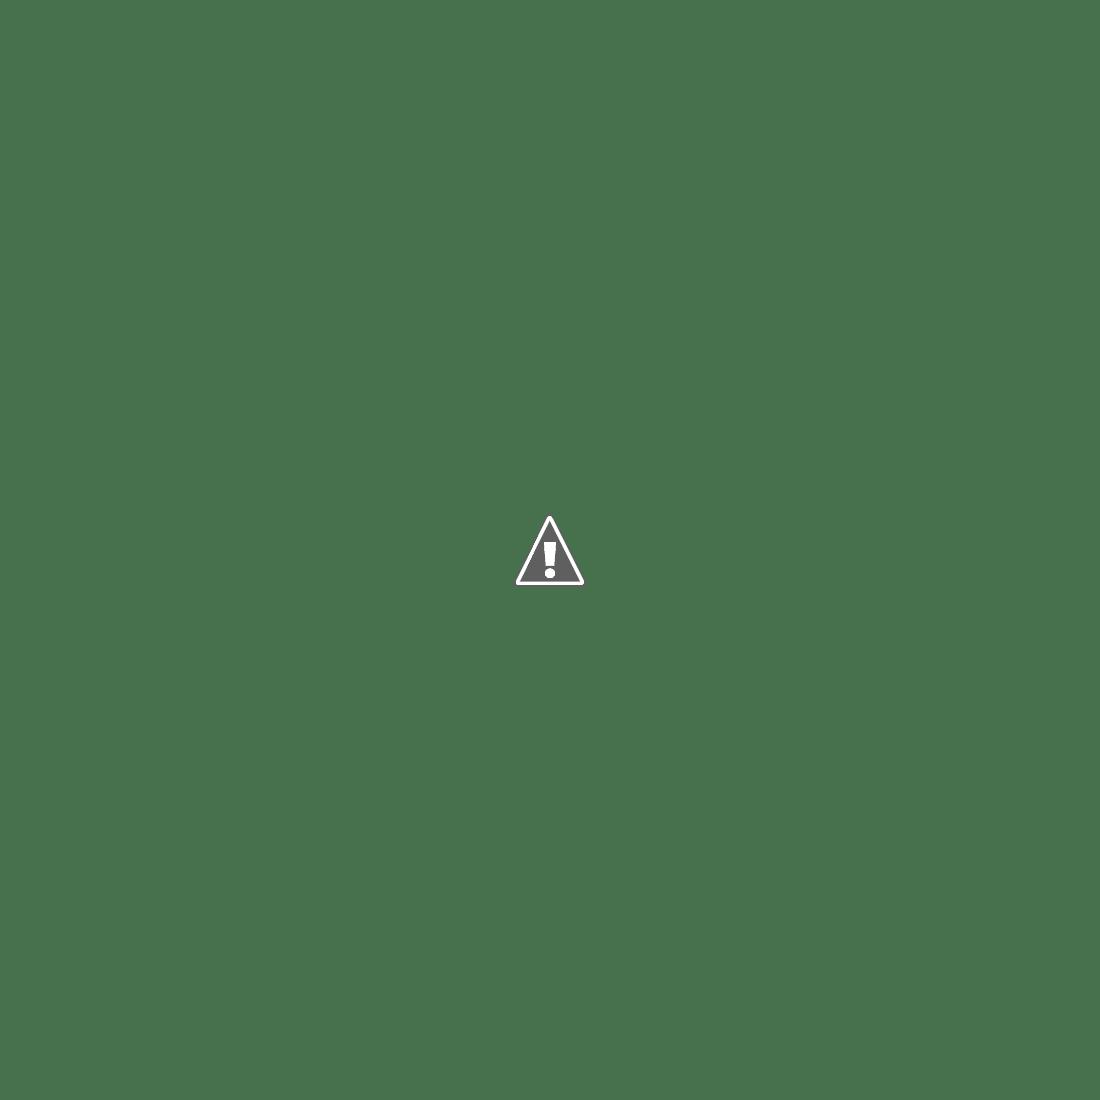 기차 밖 풍경